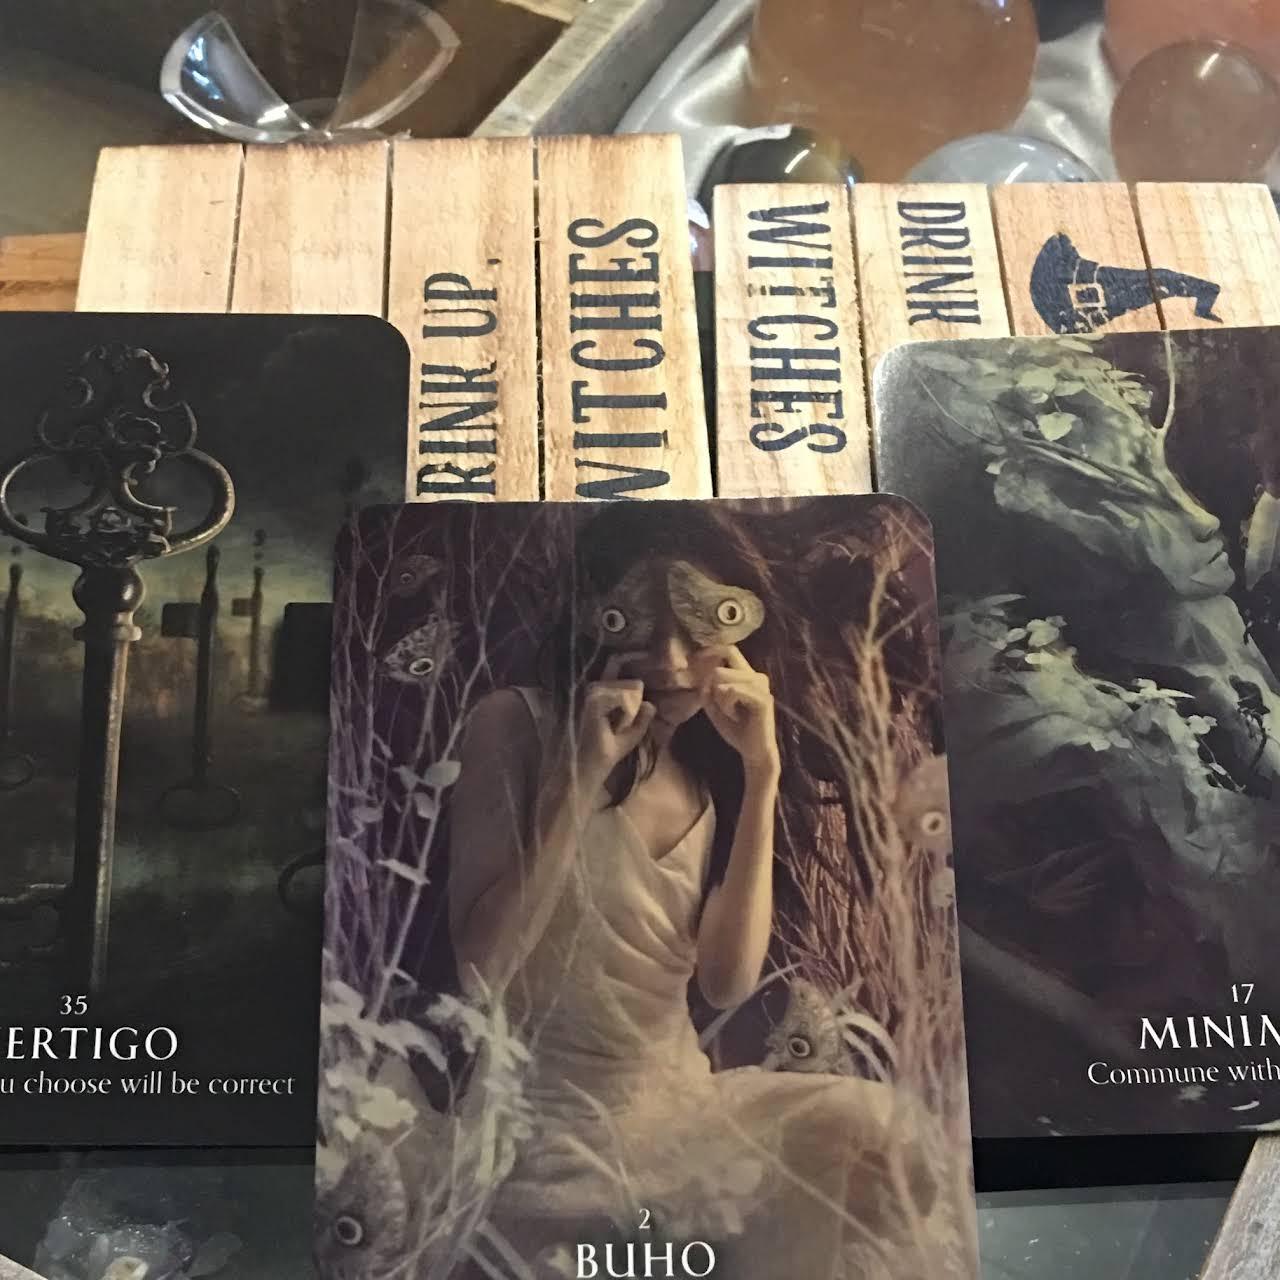 Indigo Mermaid LLC - Metaphysical Supply Store in Las Cruces